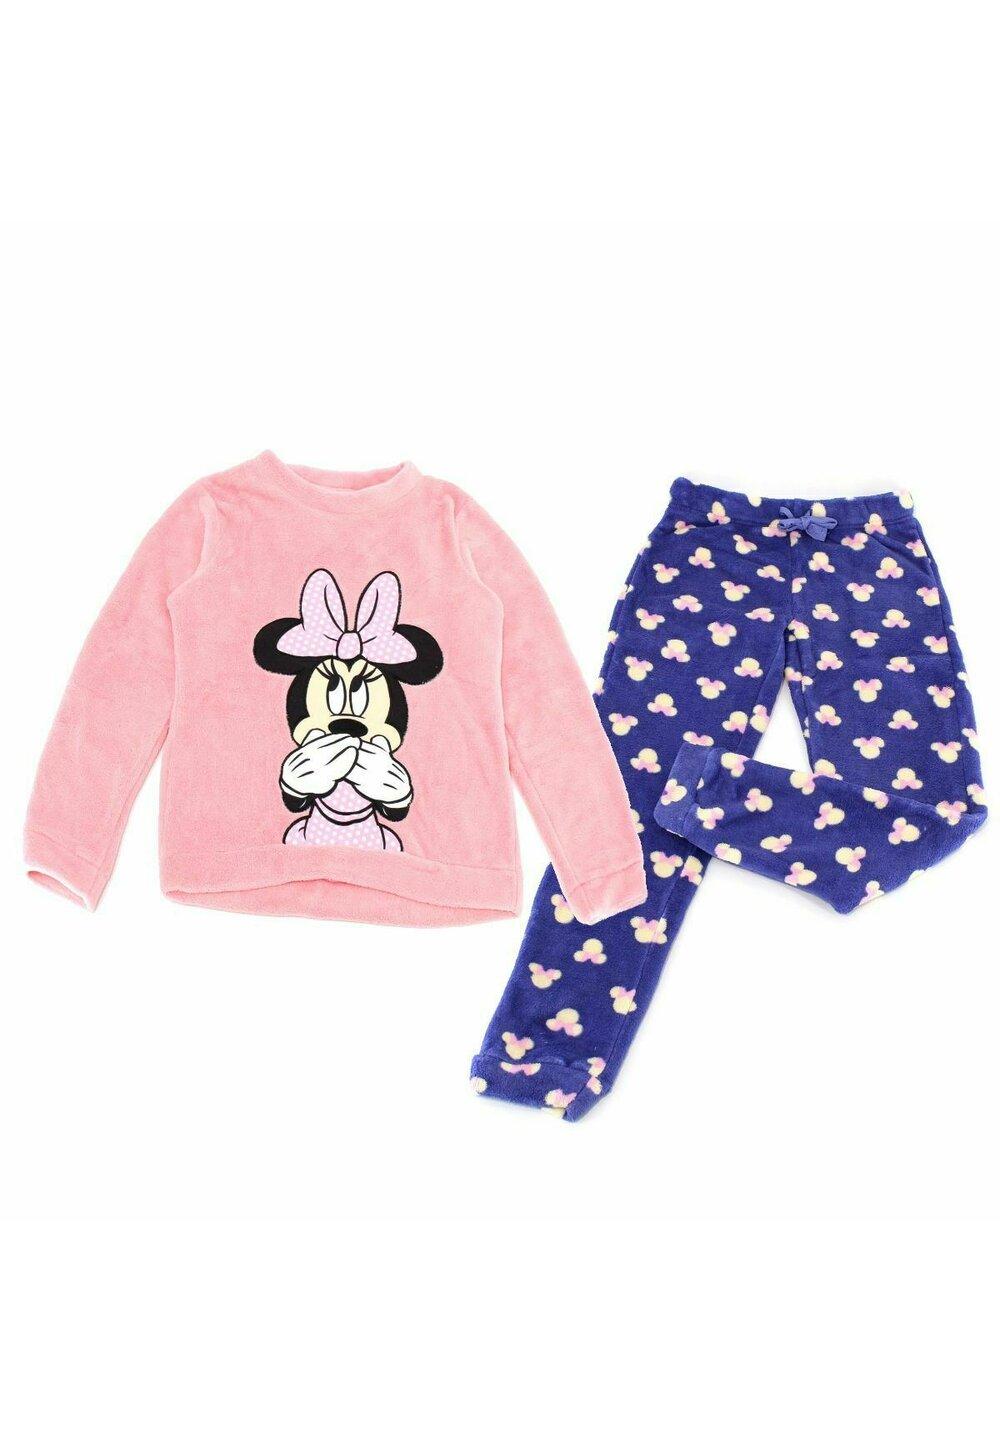 Pijama plus, Minnie Mouse, roz imagine